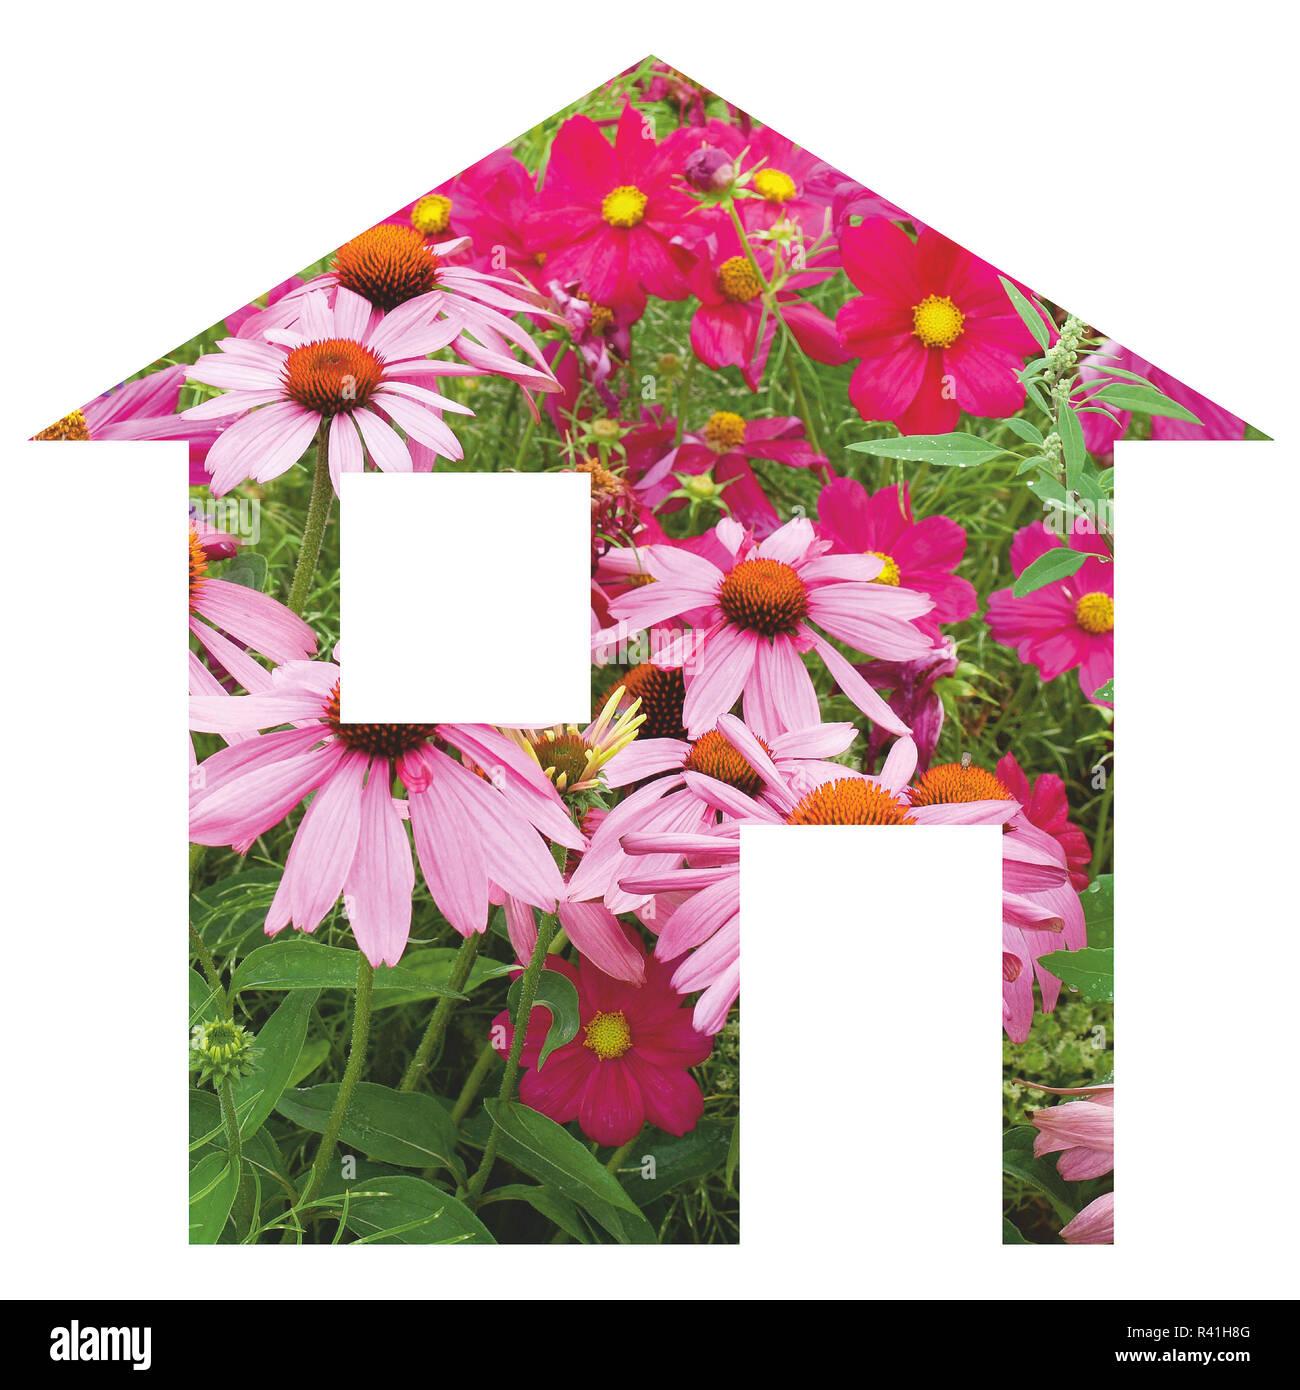 Flower house - Stock Image